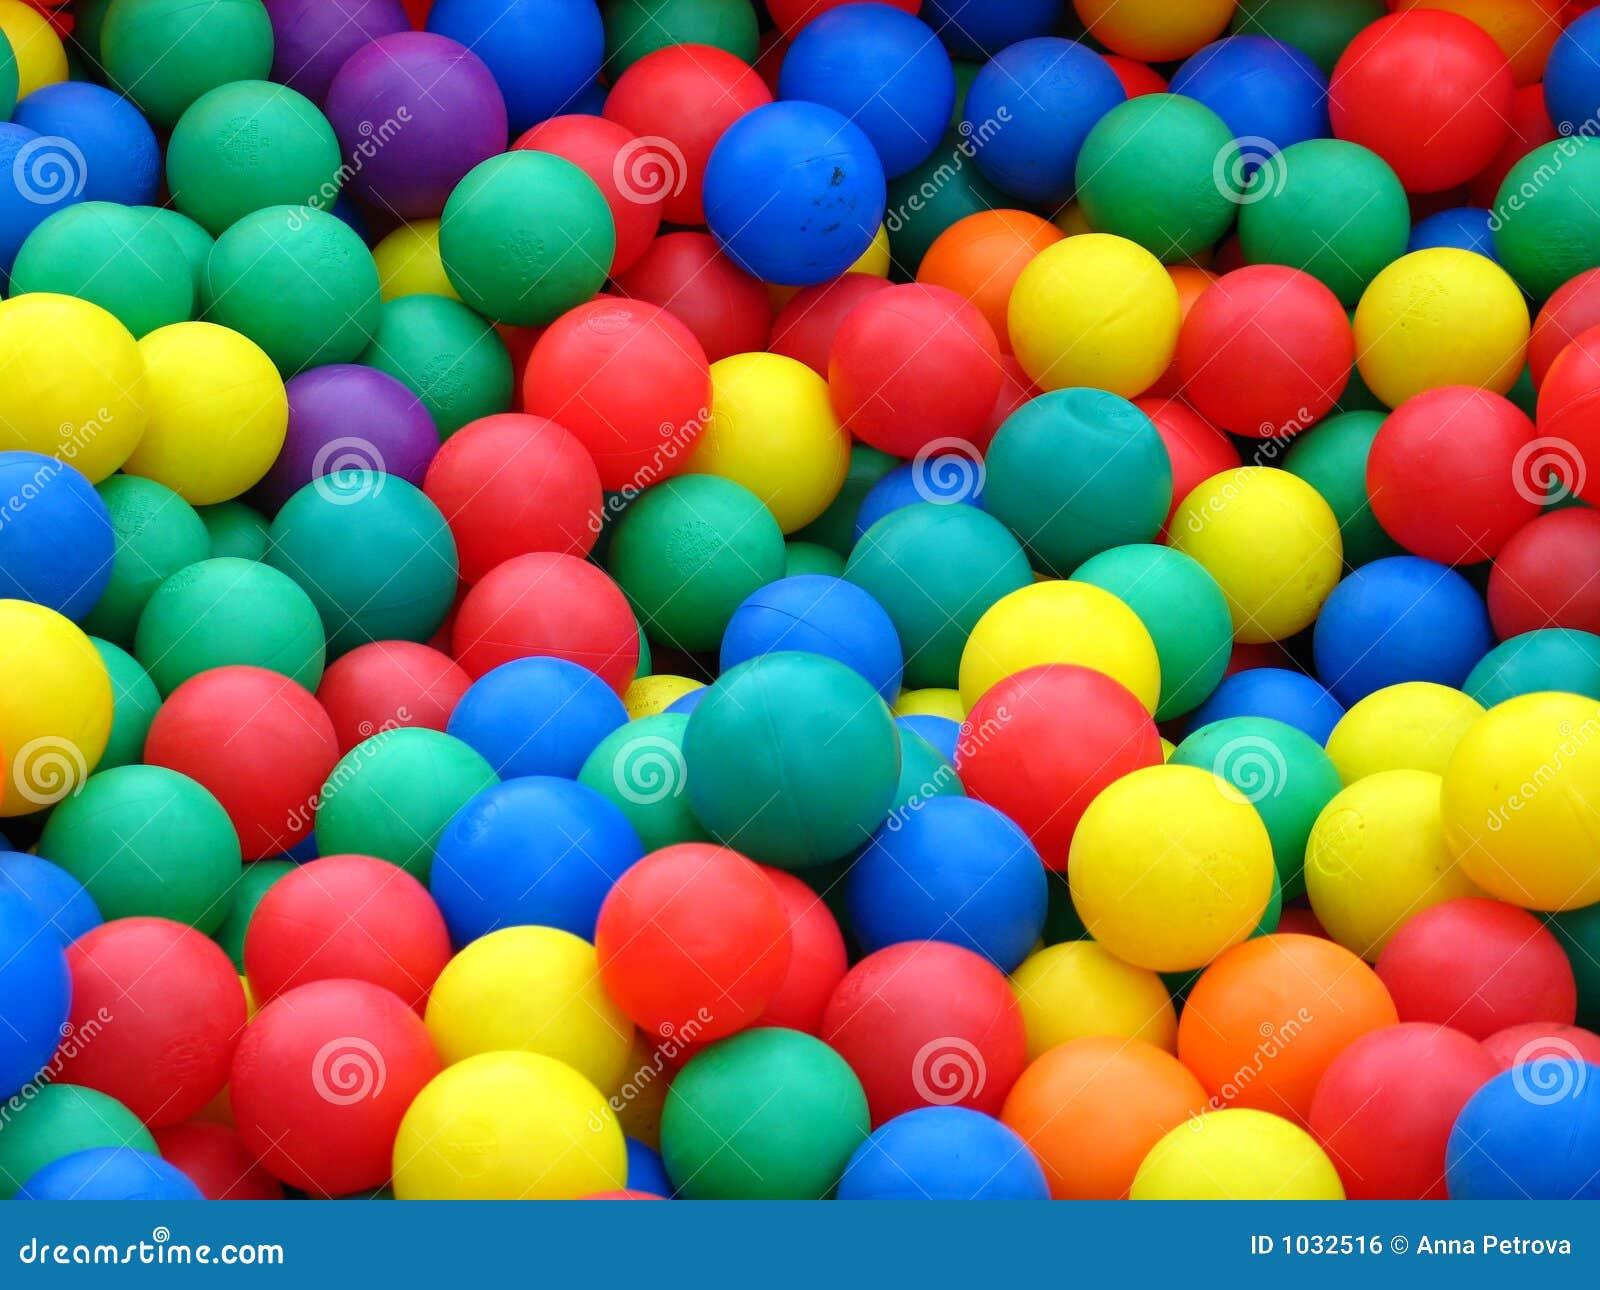 Plastic balls in different colors